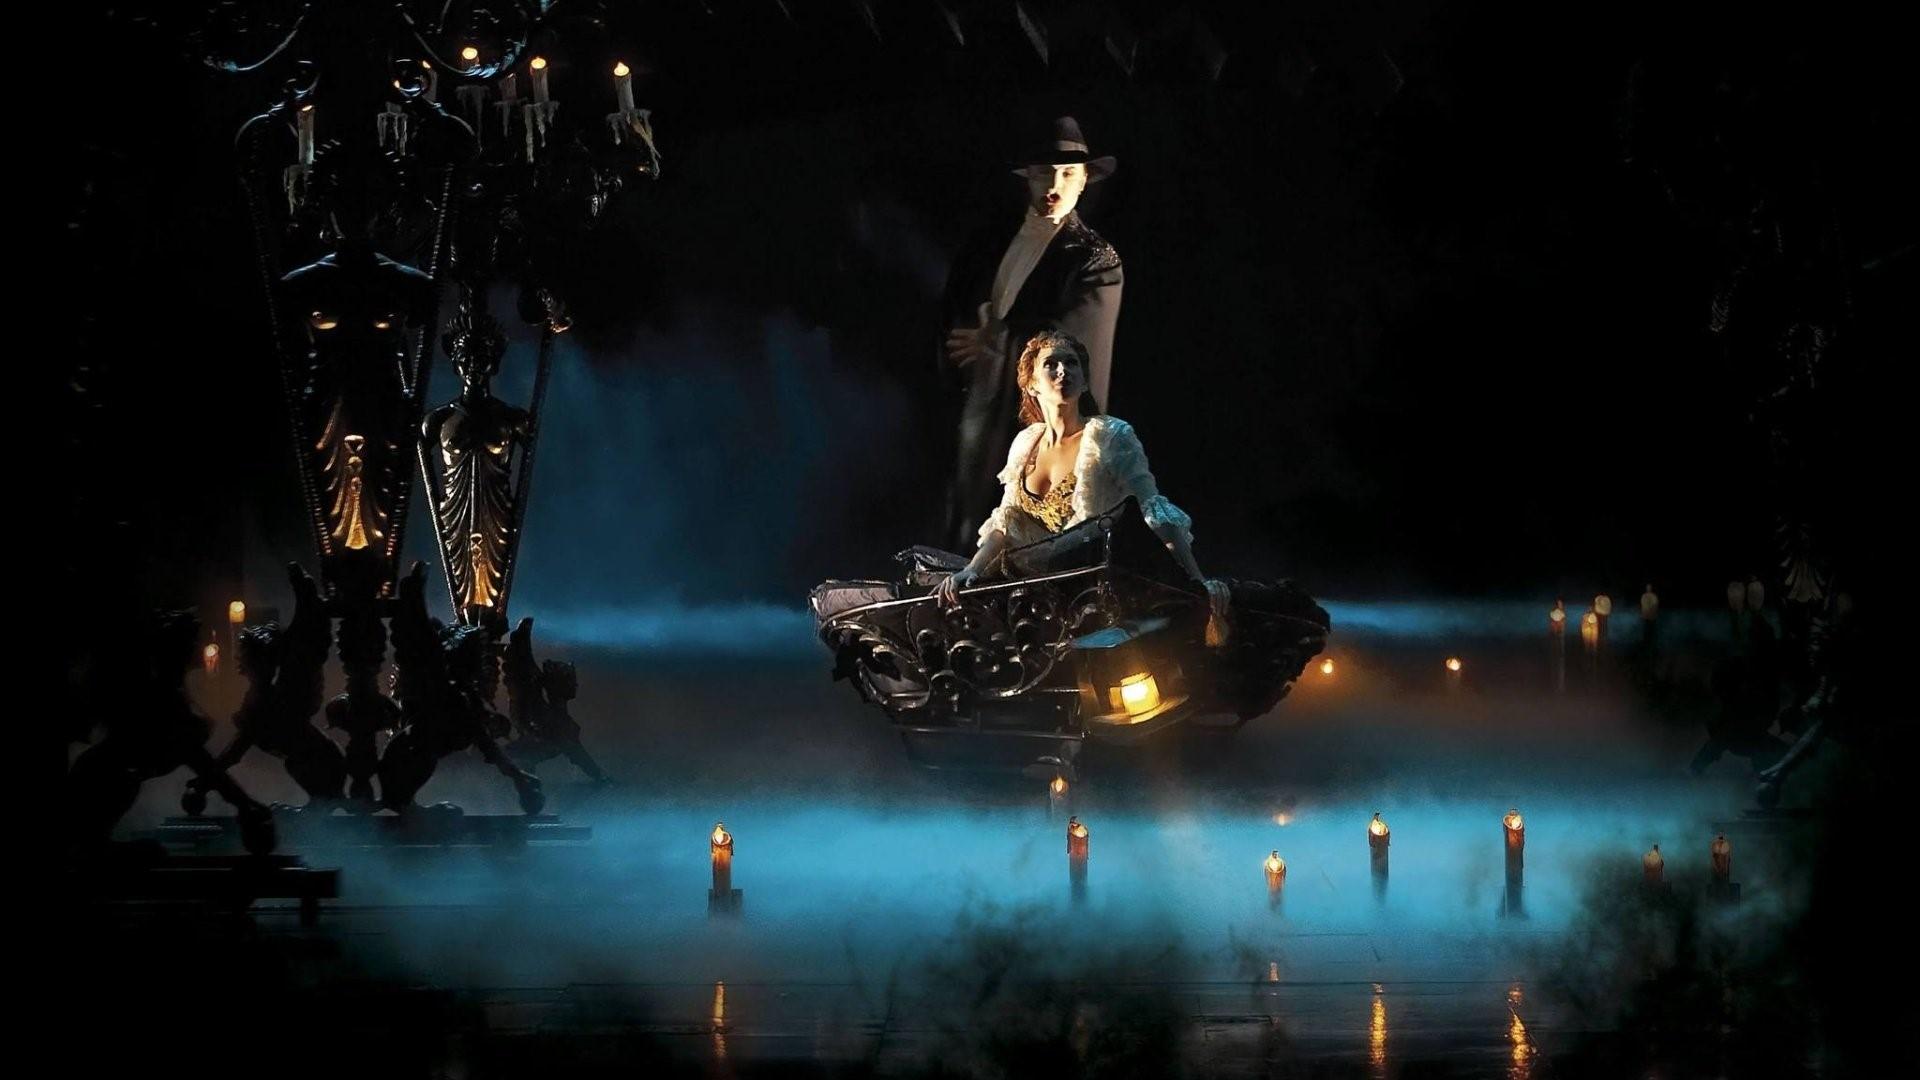 phantom of the opera wallpapers